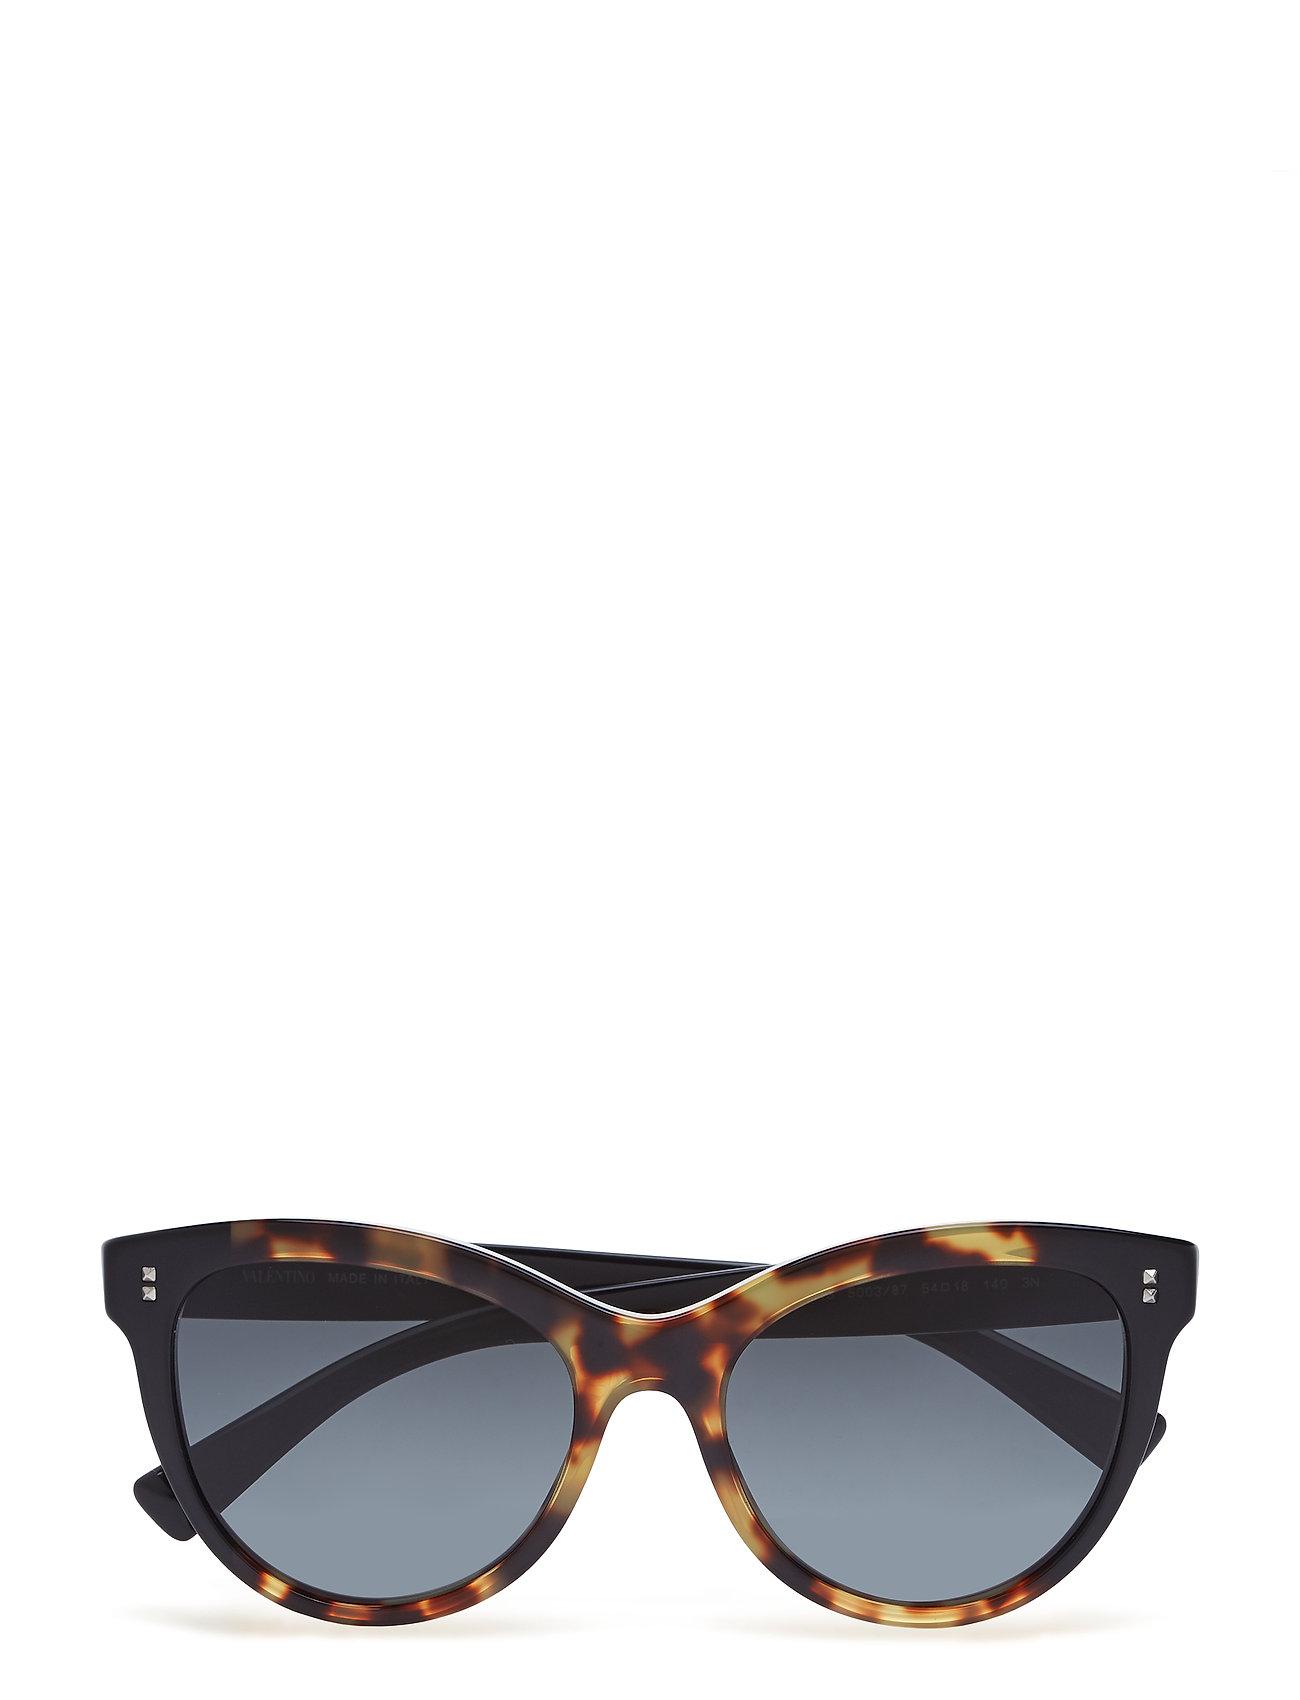 Rockstud Rivets - Valentino Sunglasses